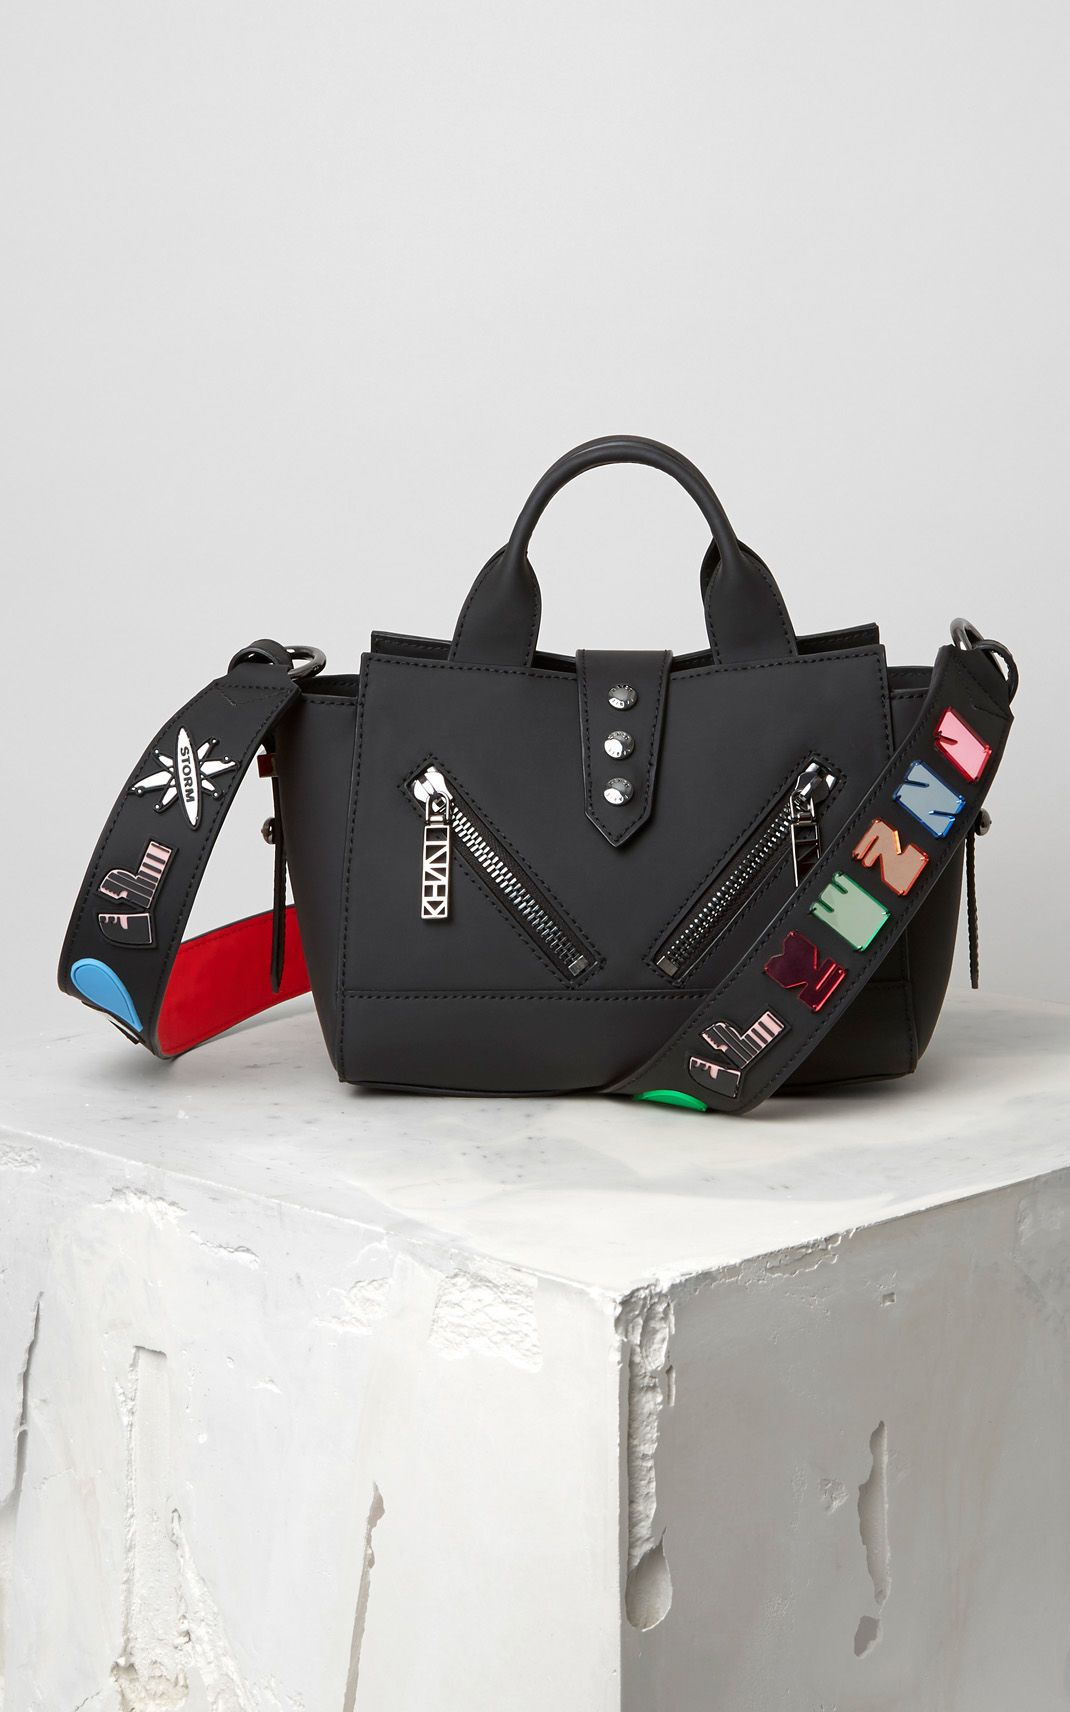 b6423887f572 Mini Kalifornia x Badges, BLACK, KENZO | Style One Must Possess ...